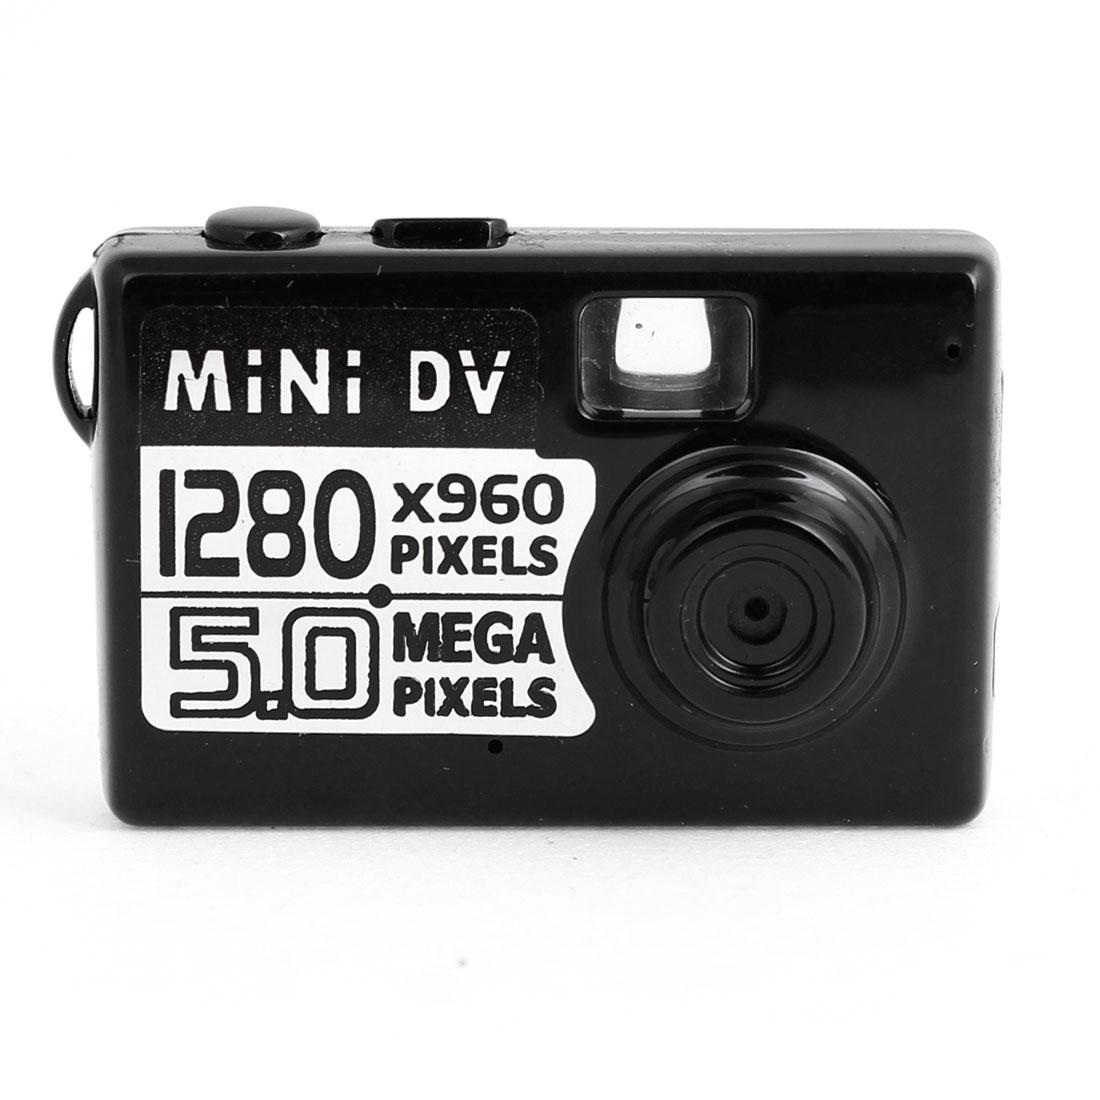 5.0MP 1280 x 960 HD Mini DVR Camera Digital Video Recorder for Car